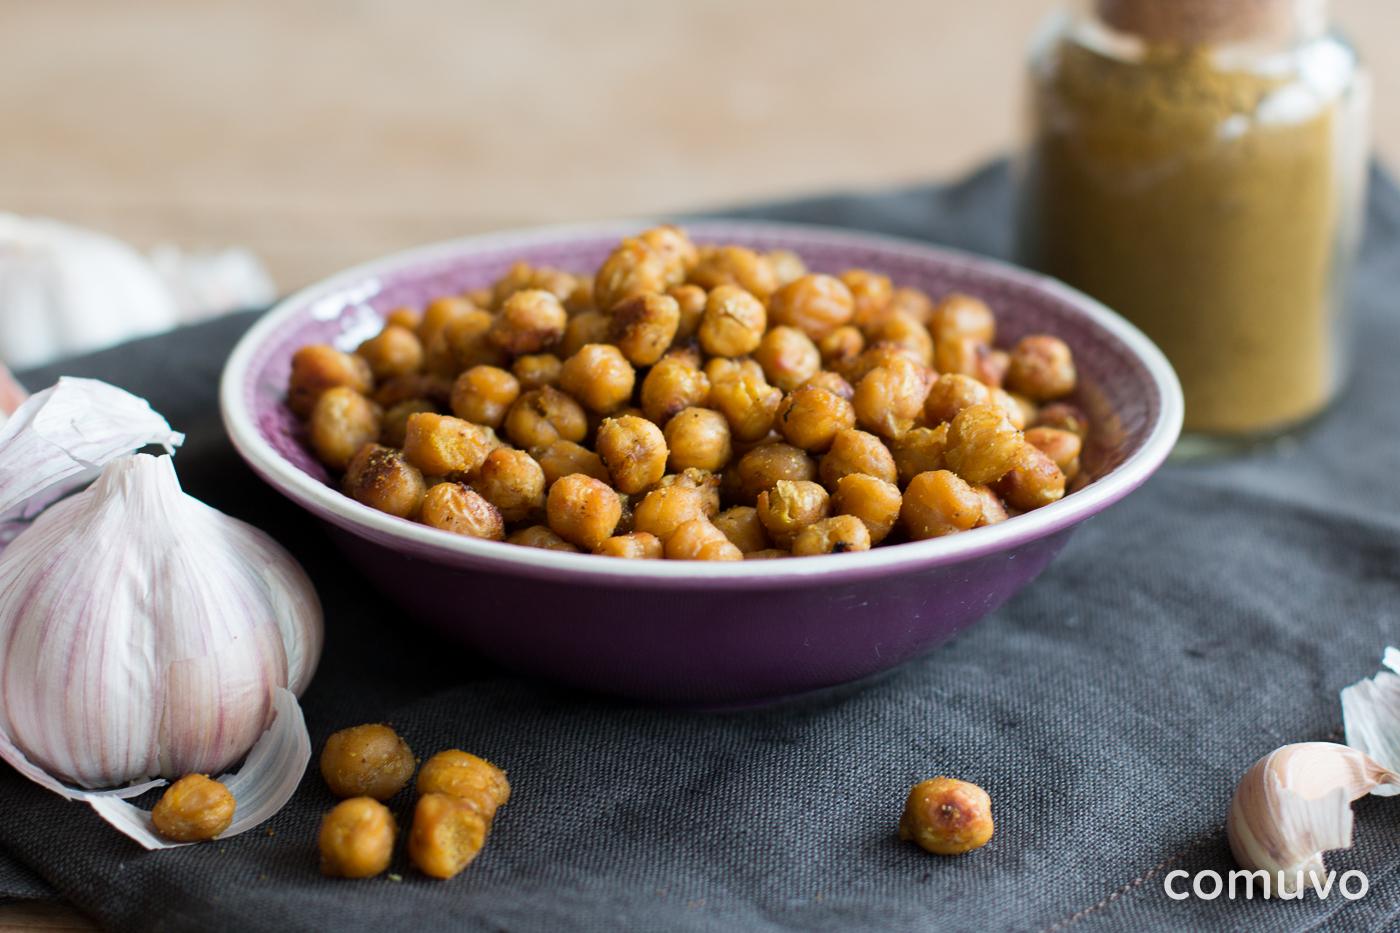 Geröstete Curry Kichererbsen | gesunde Snacks | comuvo